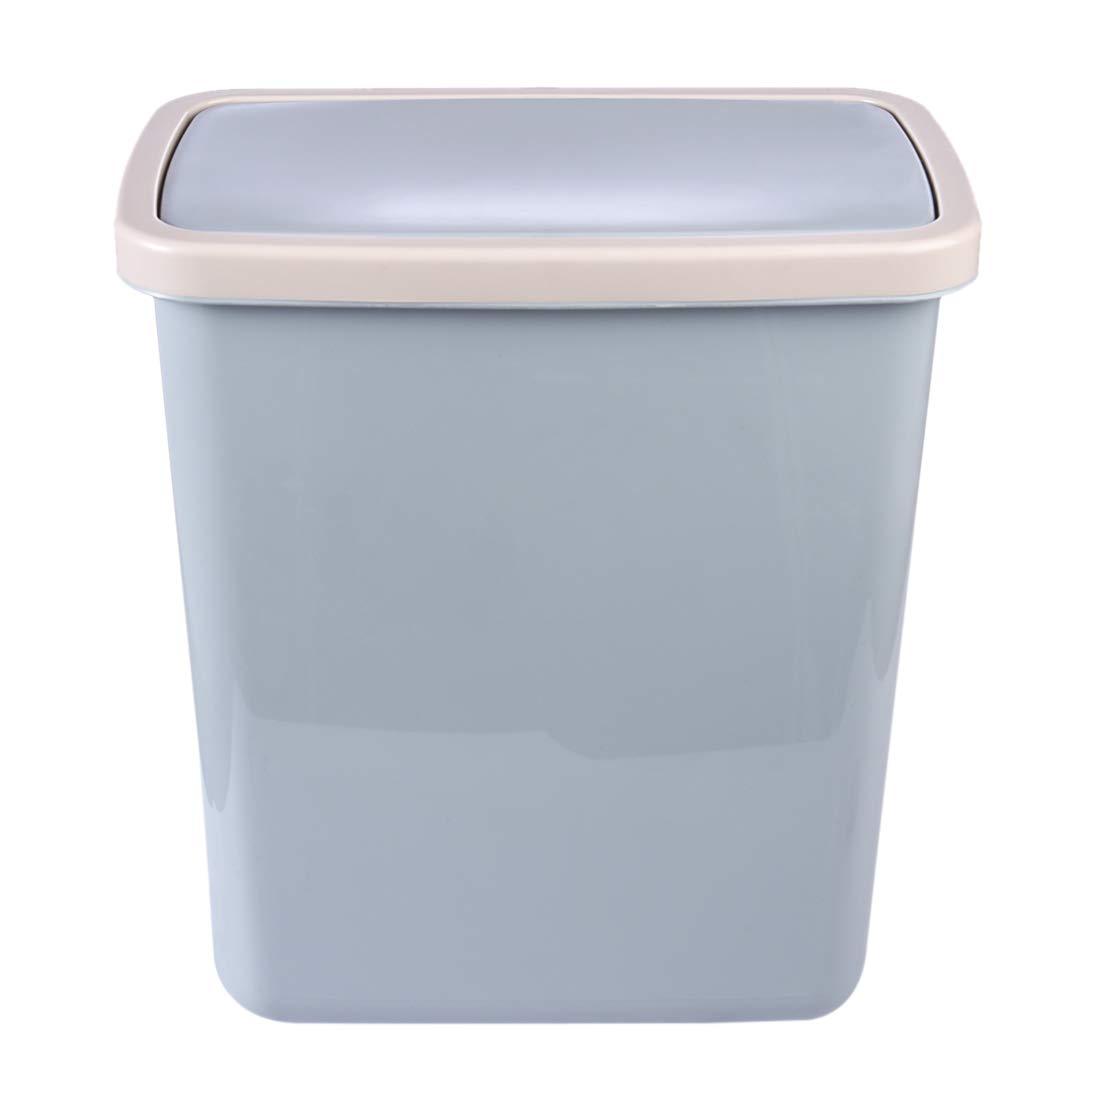 9L Cubo de Basura de Pl/ástico Cesta de Papel con Tapa 15,5 x 26,5 x 30 cm Cocina o Ba/ño Papelera de Oficina iVansa Papelera de Reciclaje